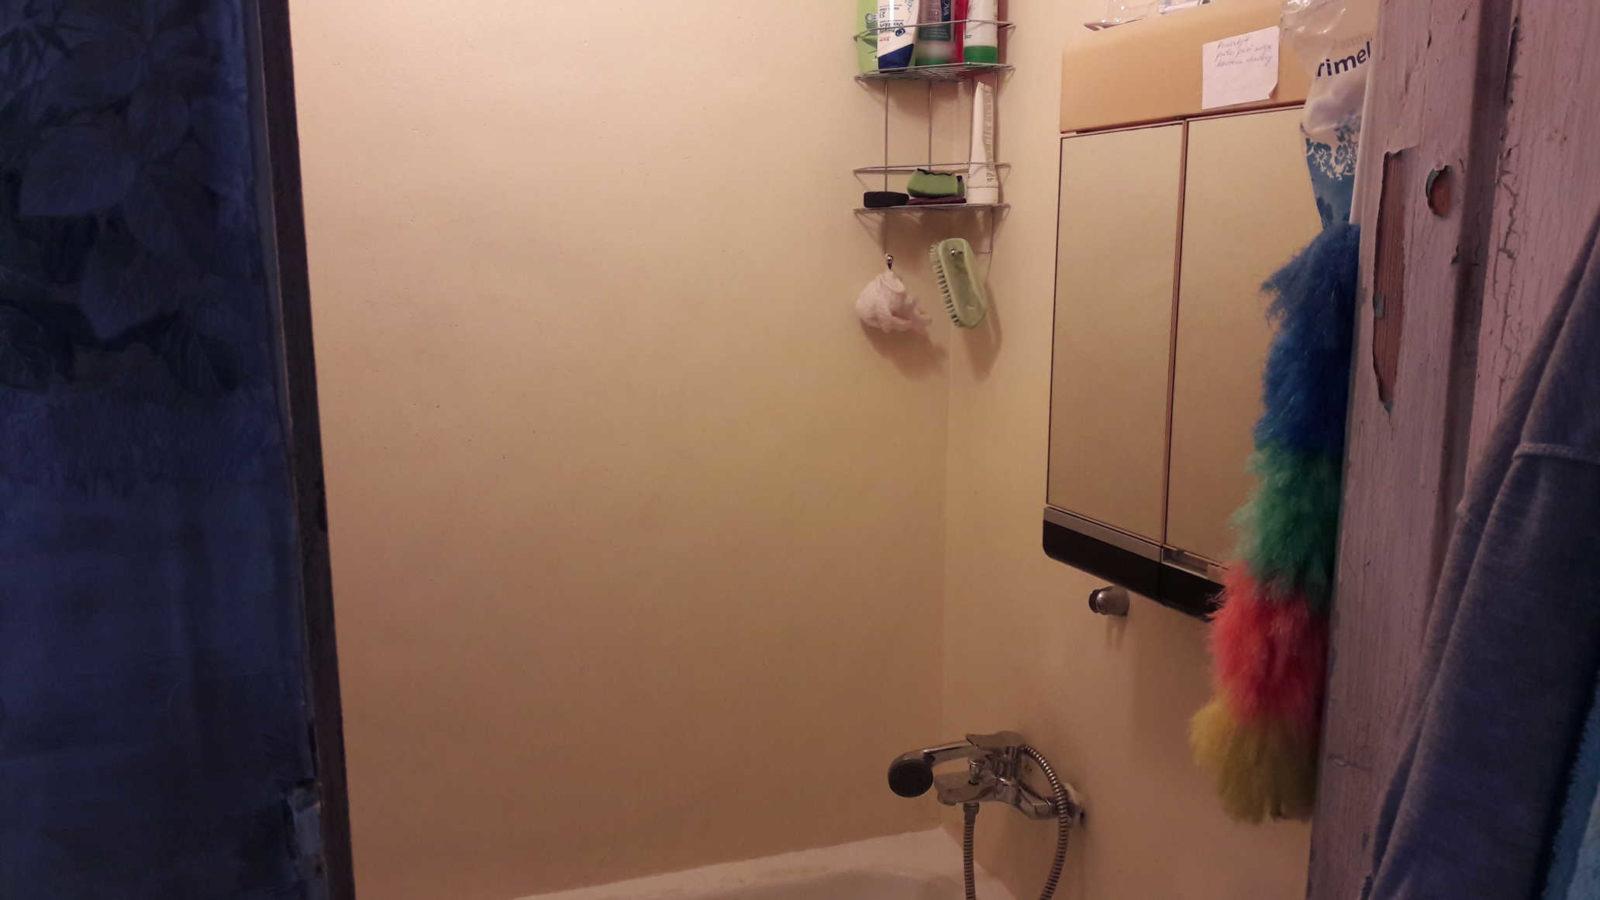 2-ju-kambariu-butas-klaipedoje-vonia-01